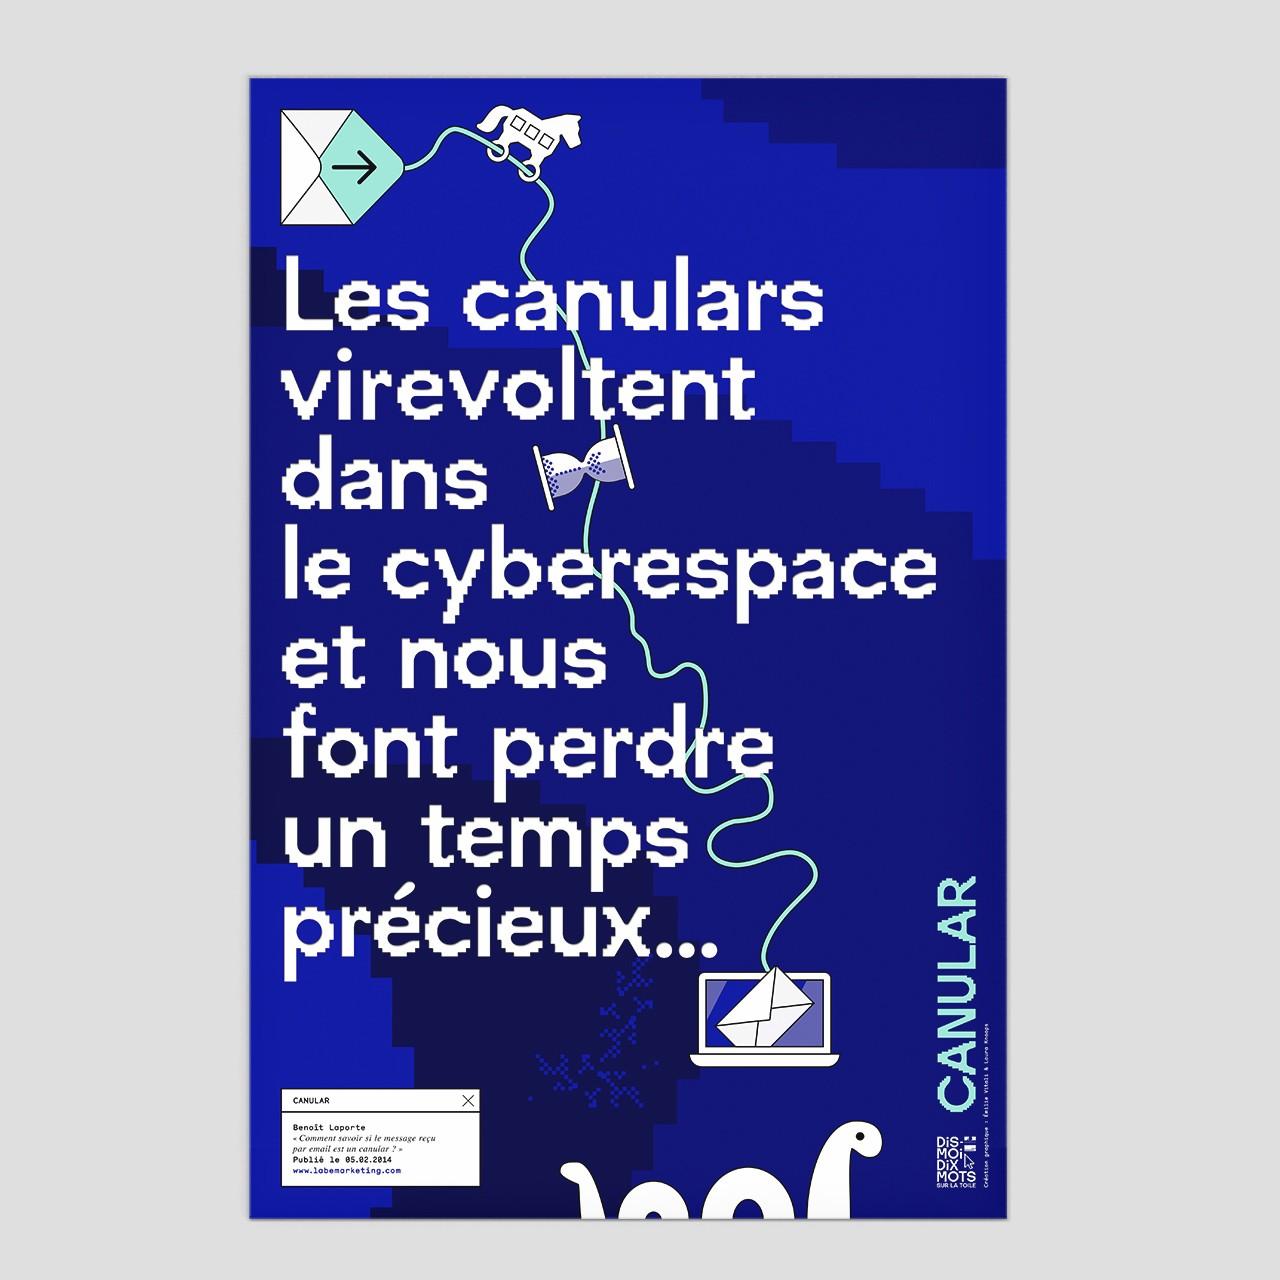 Studio Laura Knoops — Design & Art direction Dis-moi dix mots